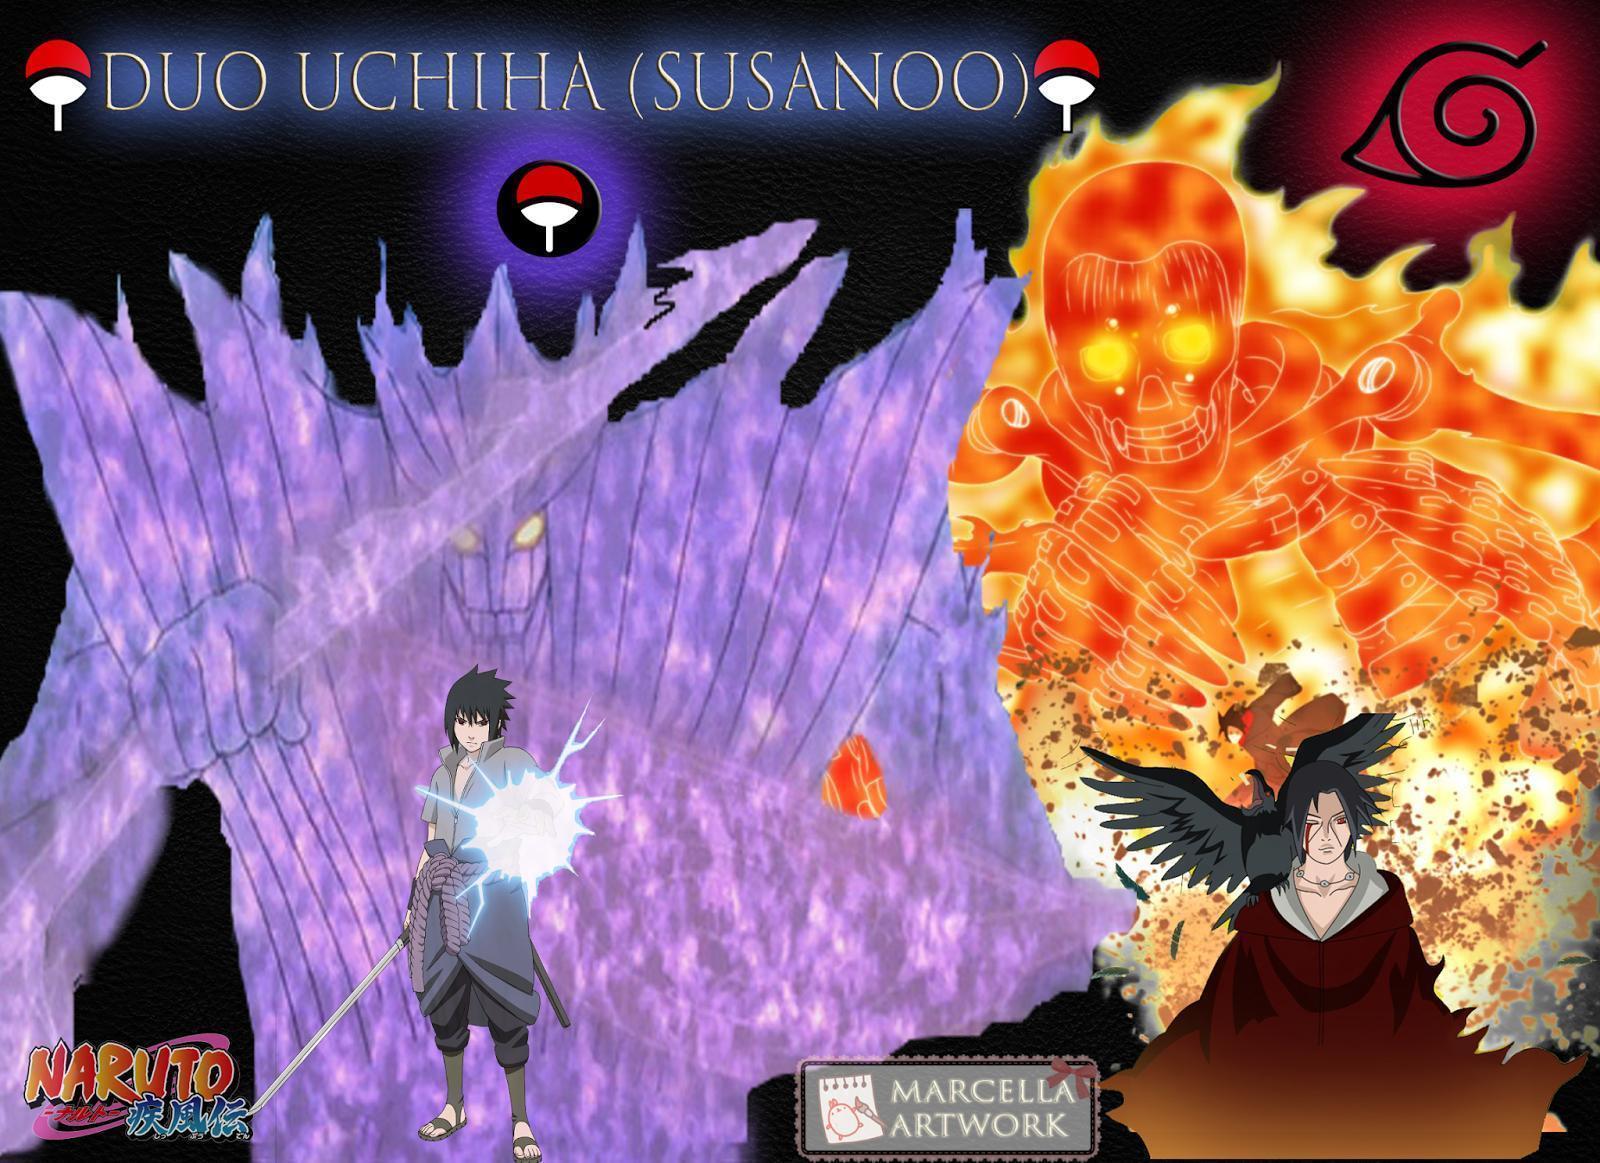 Naruto Kyuubi Mode Wallpaper Hd Itachi Susanoo Wallpapers Wallpaper Cave